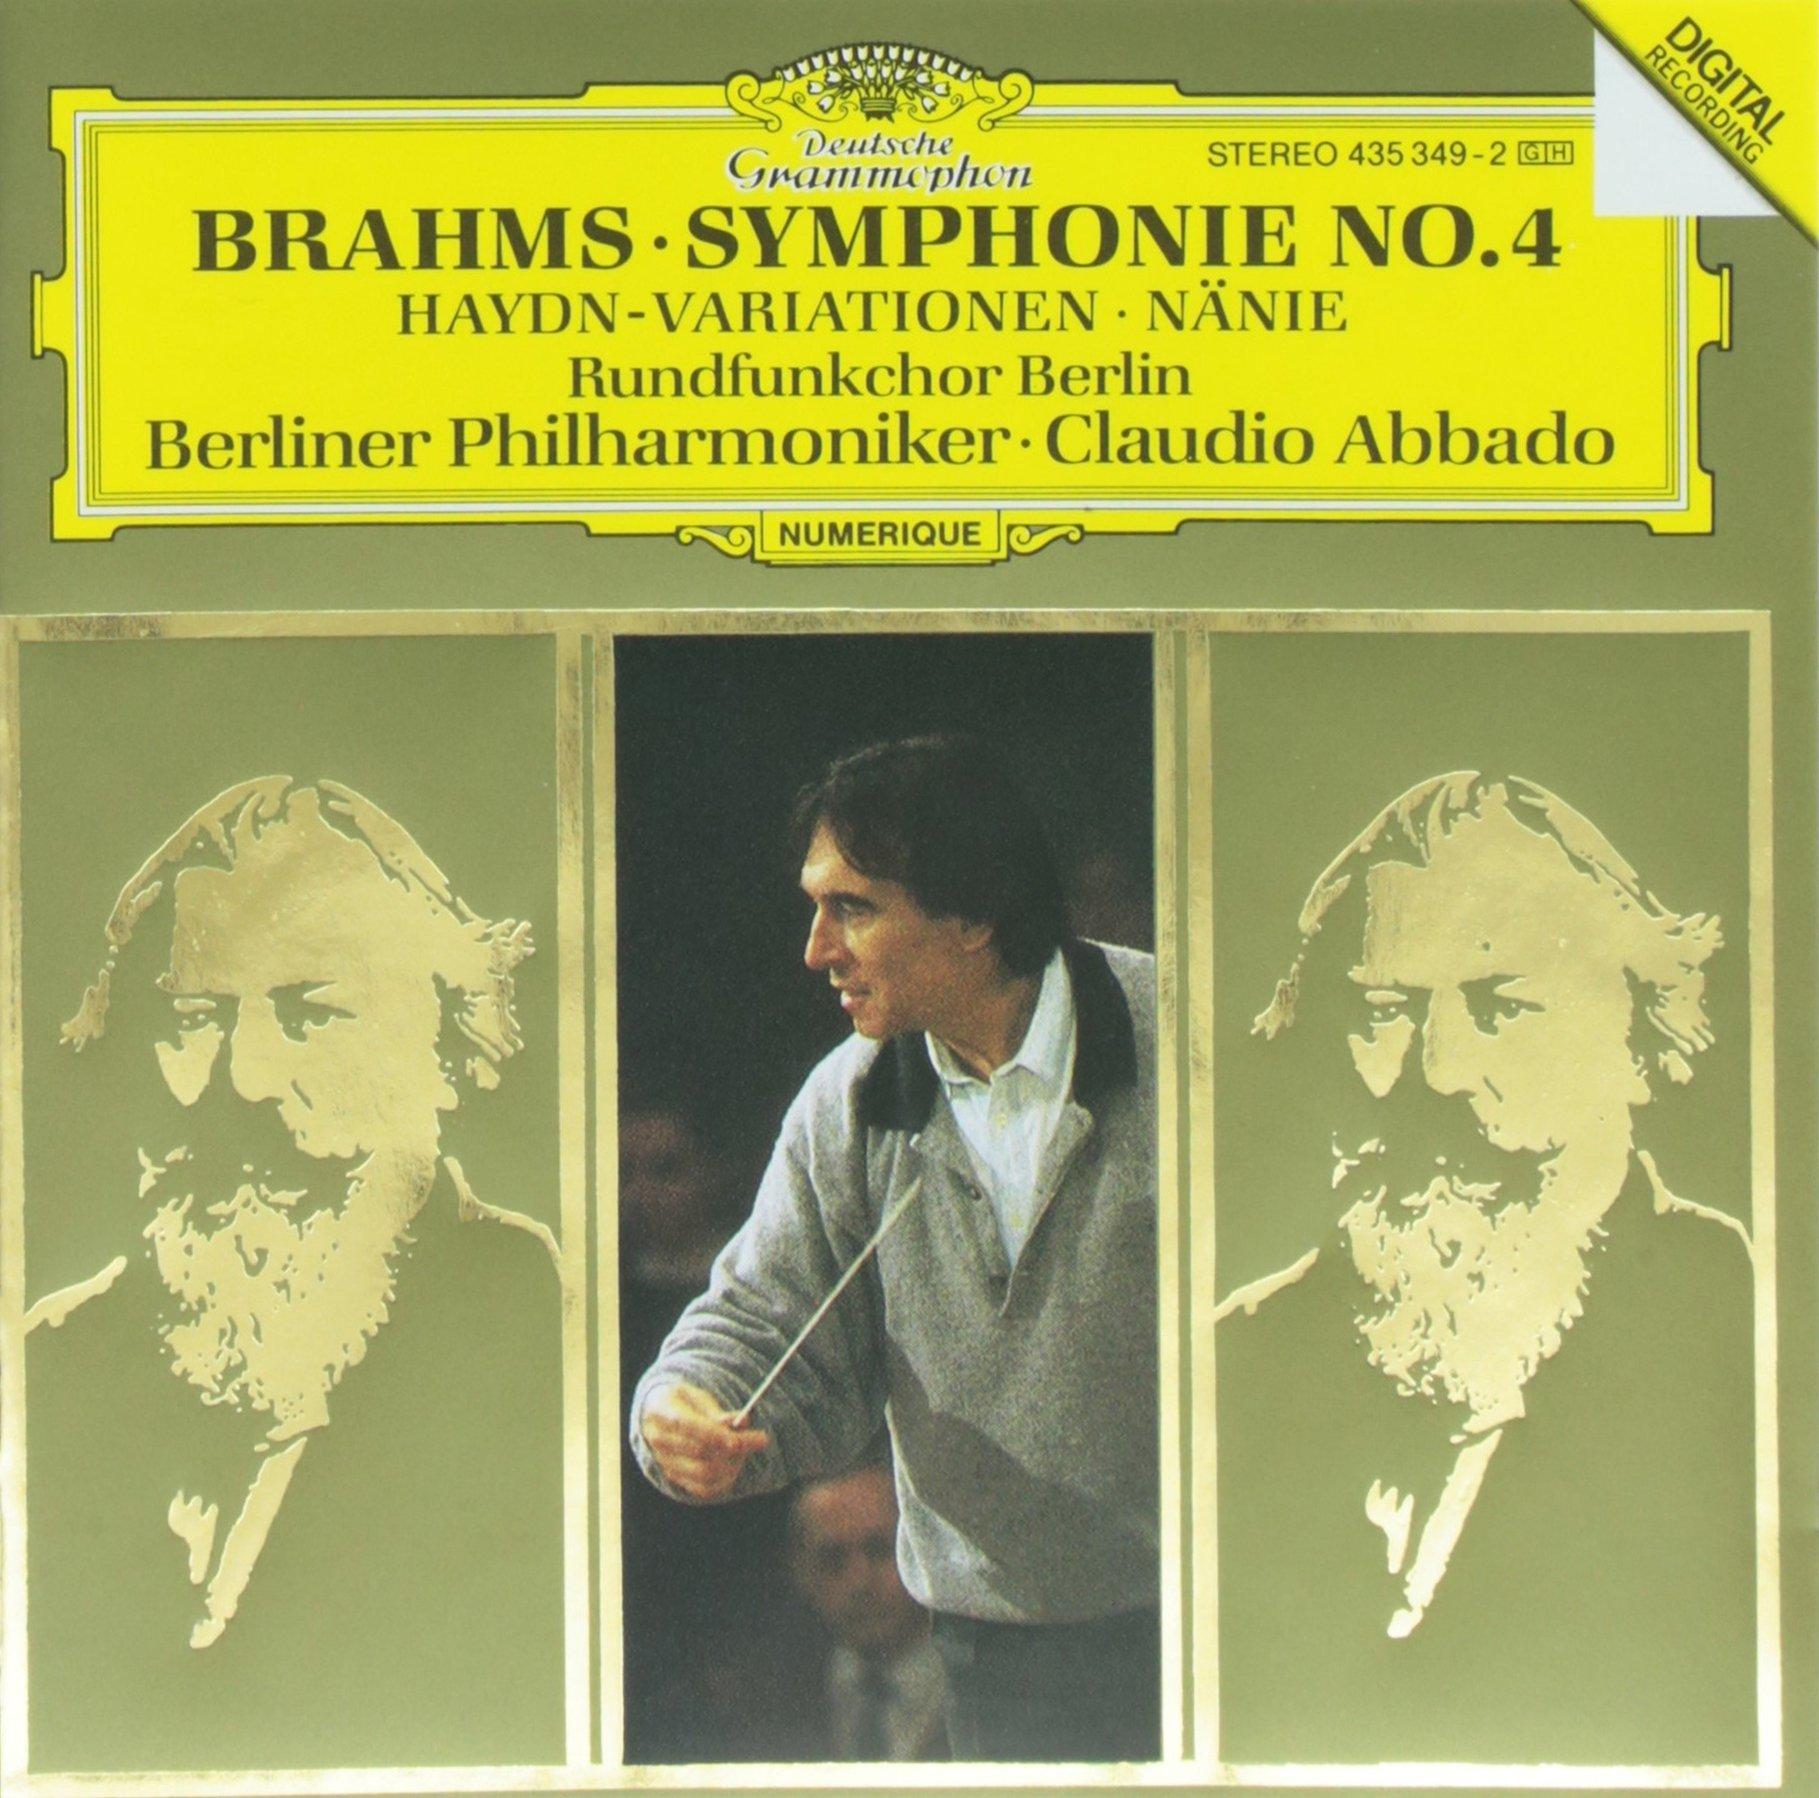 Brahms: Symphony No. 4 / Haydn Variations / Nänie